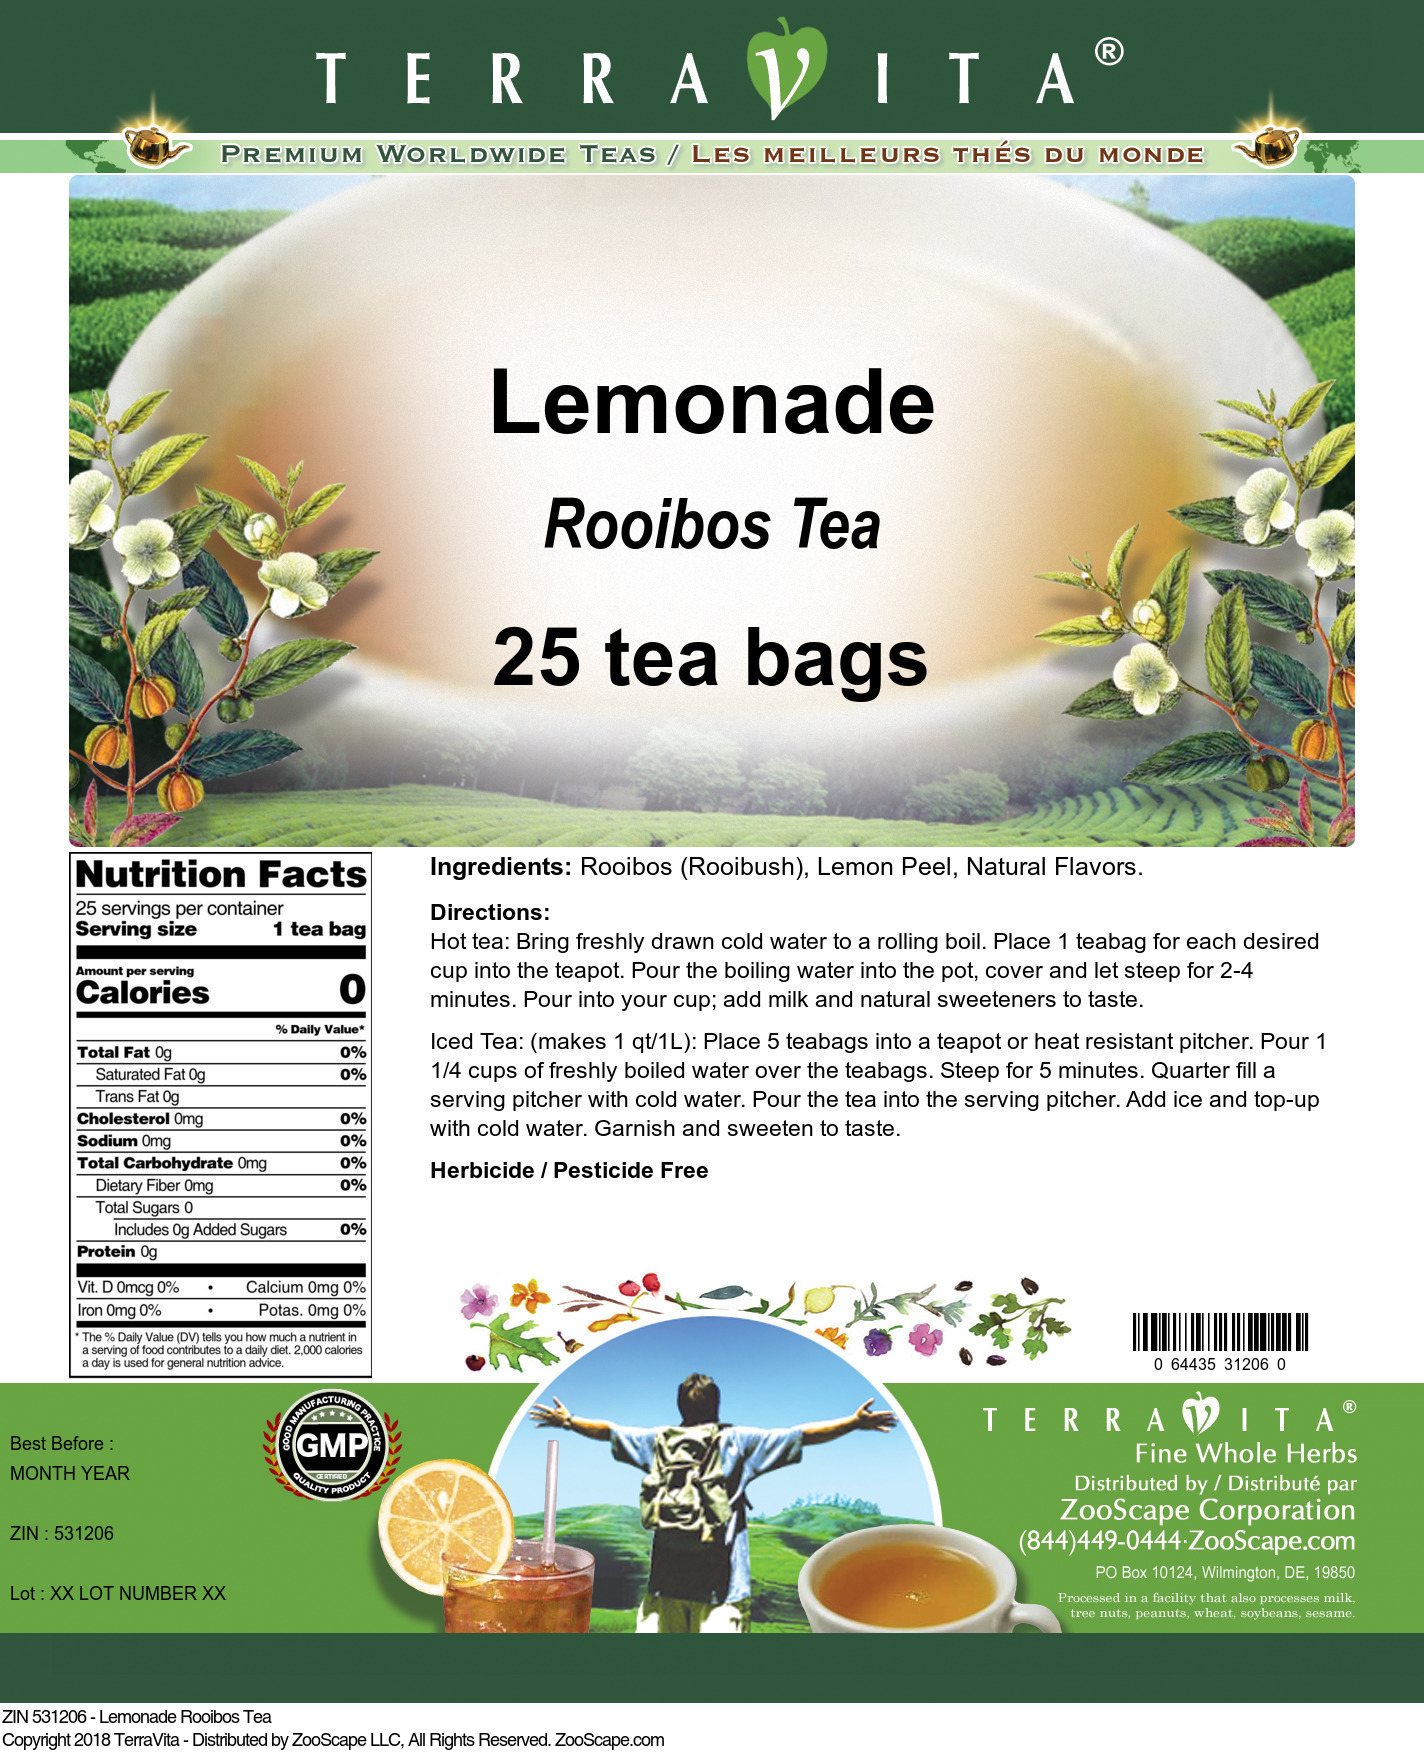 Lemonade Rooibos Tea